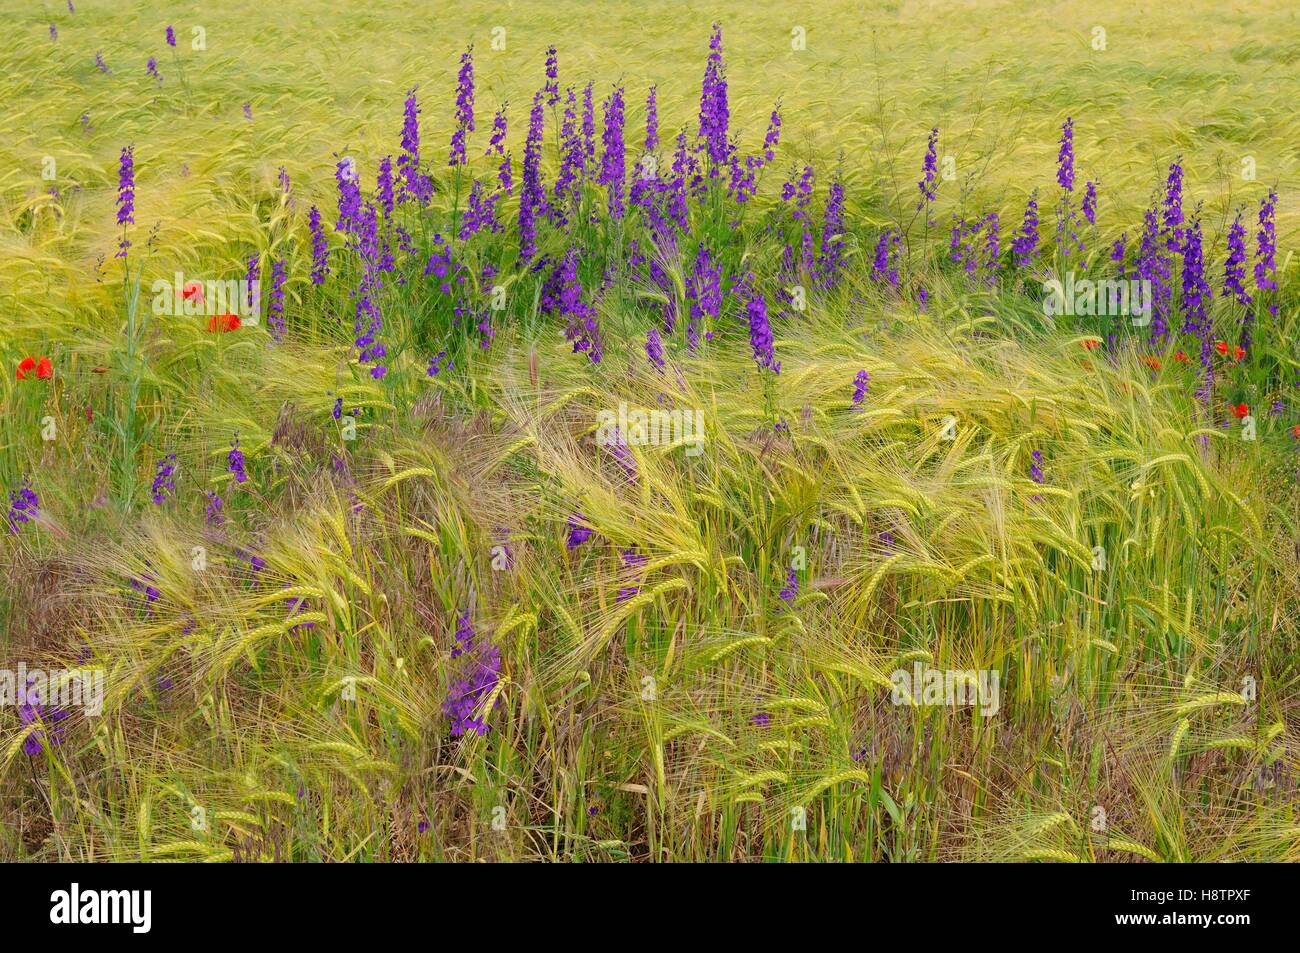 Oriental Knight's Spurs (Consolida orientalis) in flower in a field of barley, Danube Delta, Romania - Stock Image